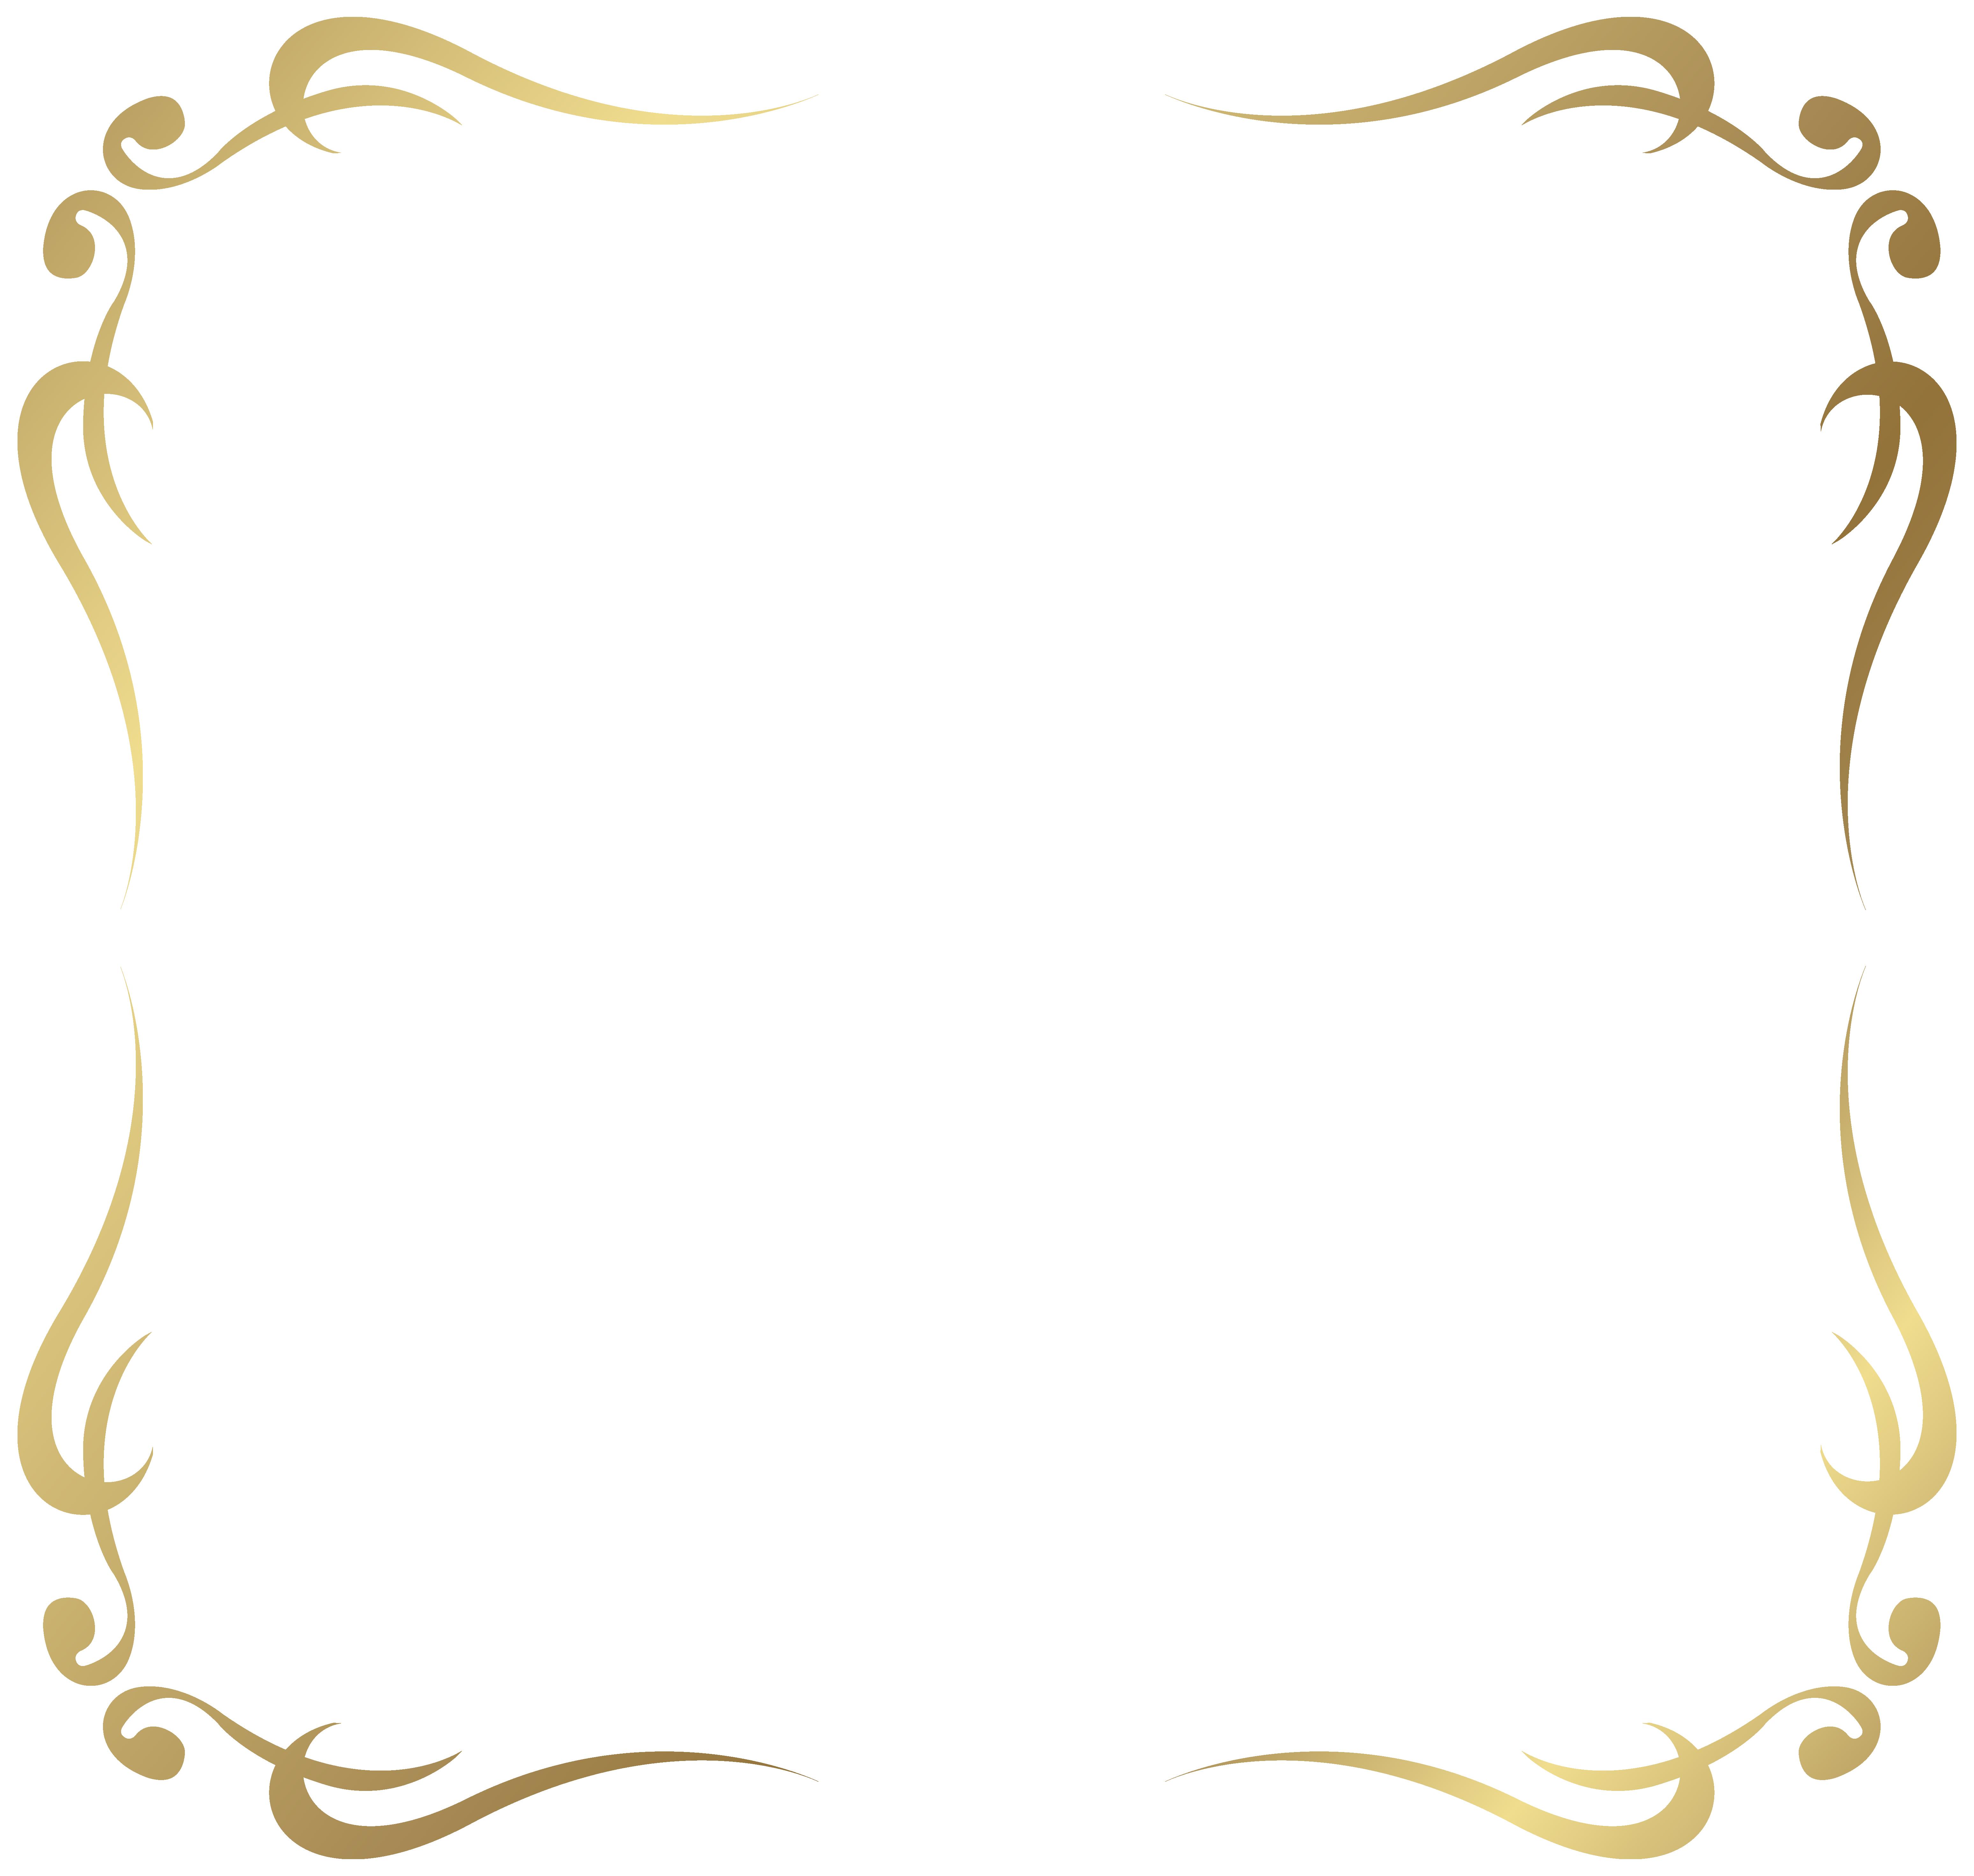 Magic clipart decorative swirl. Frame border png picture